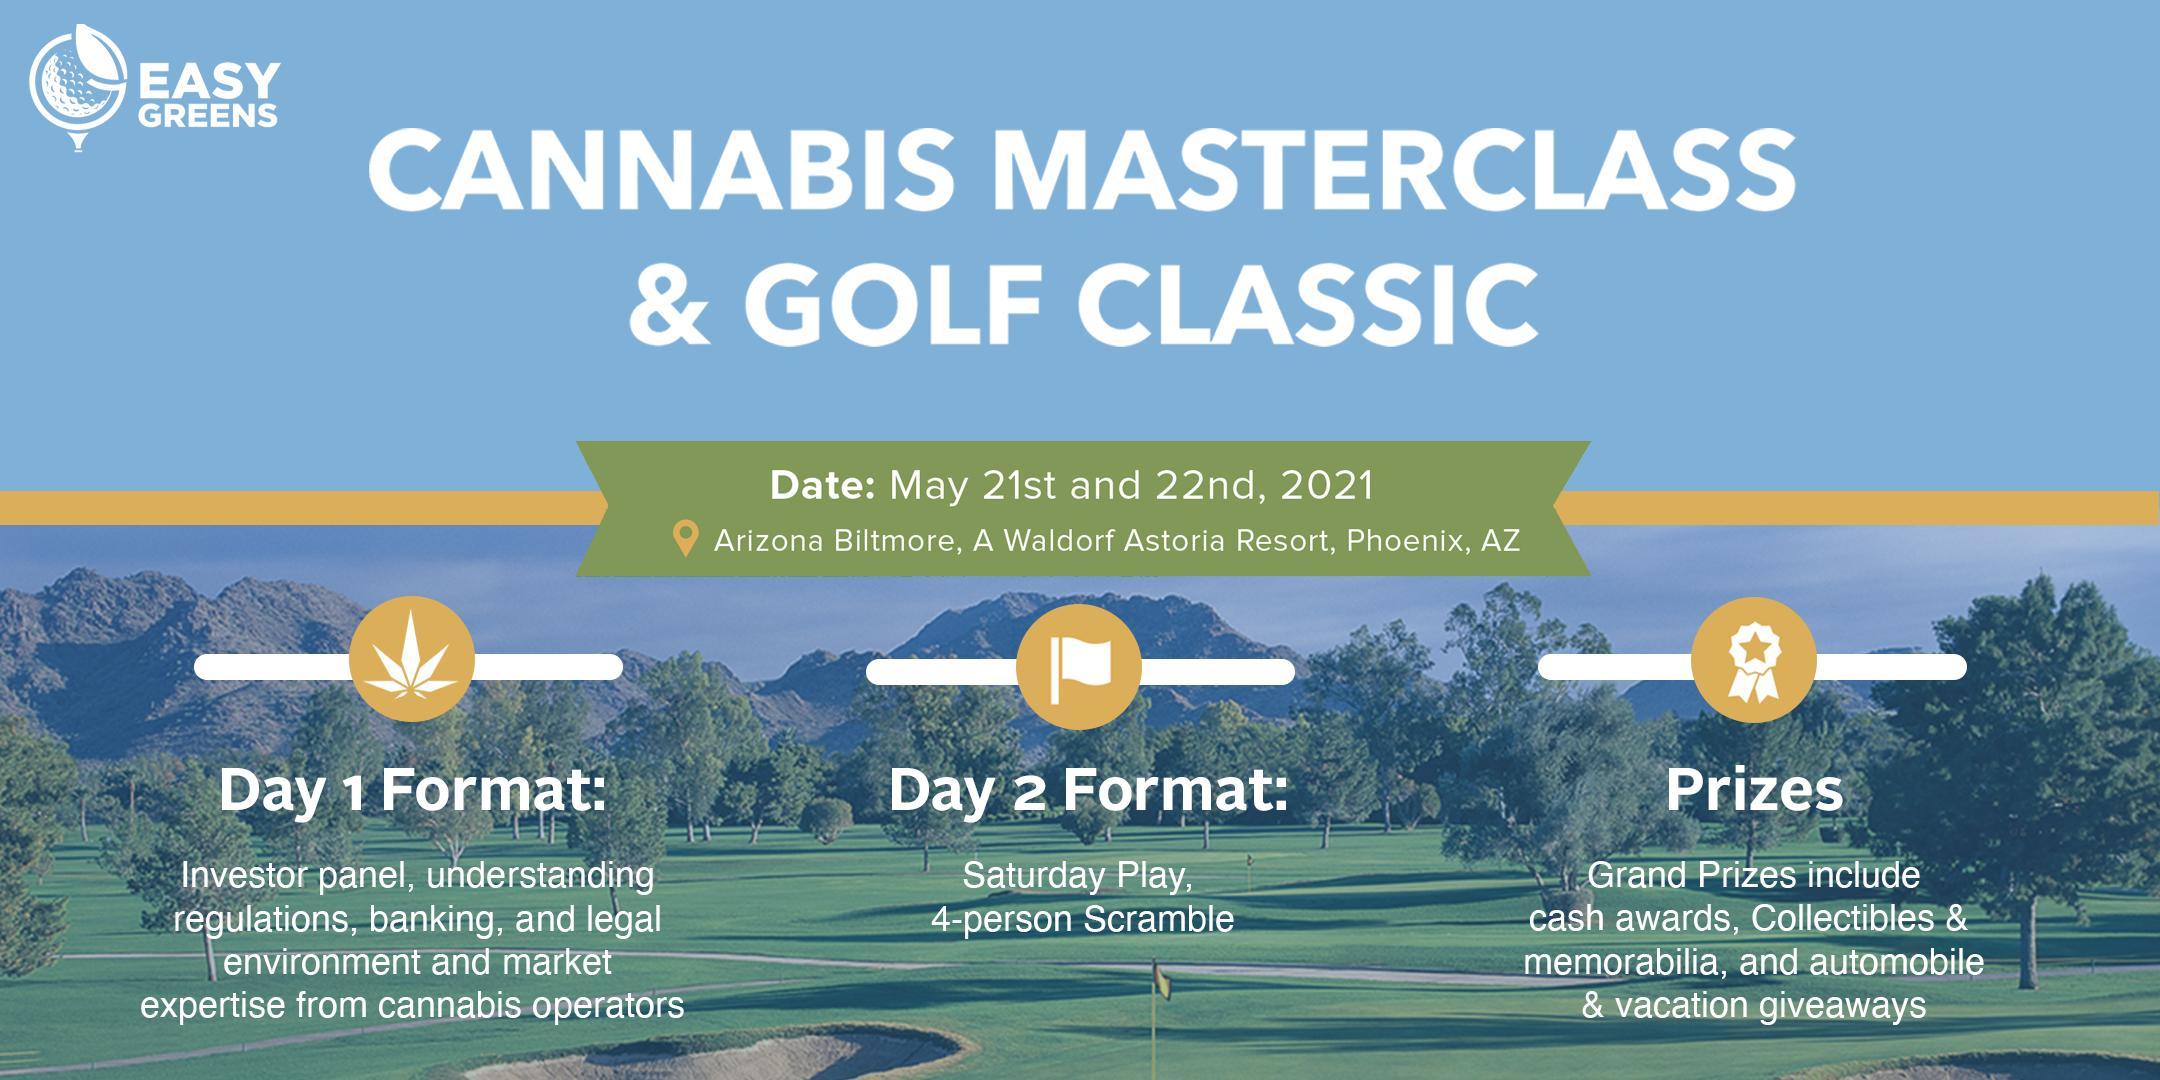 Easy Greens - Cannabis Master Class & Golf Classic